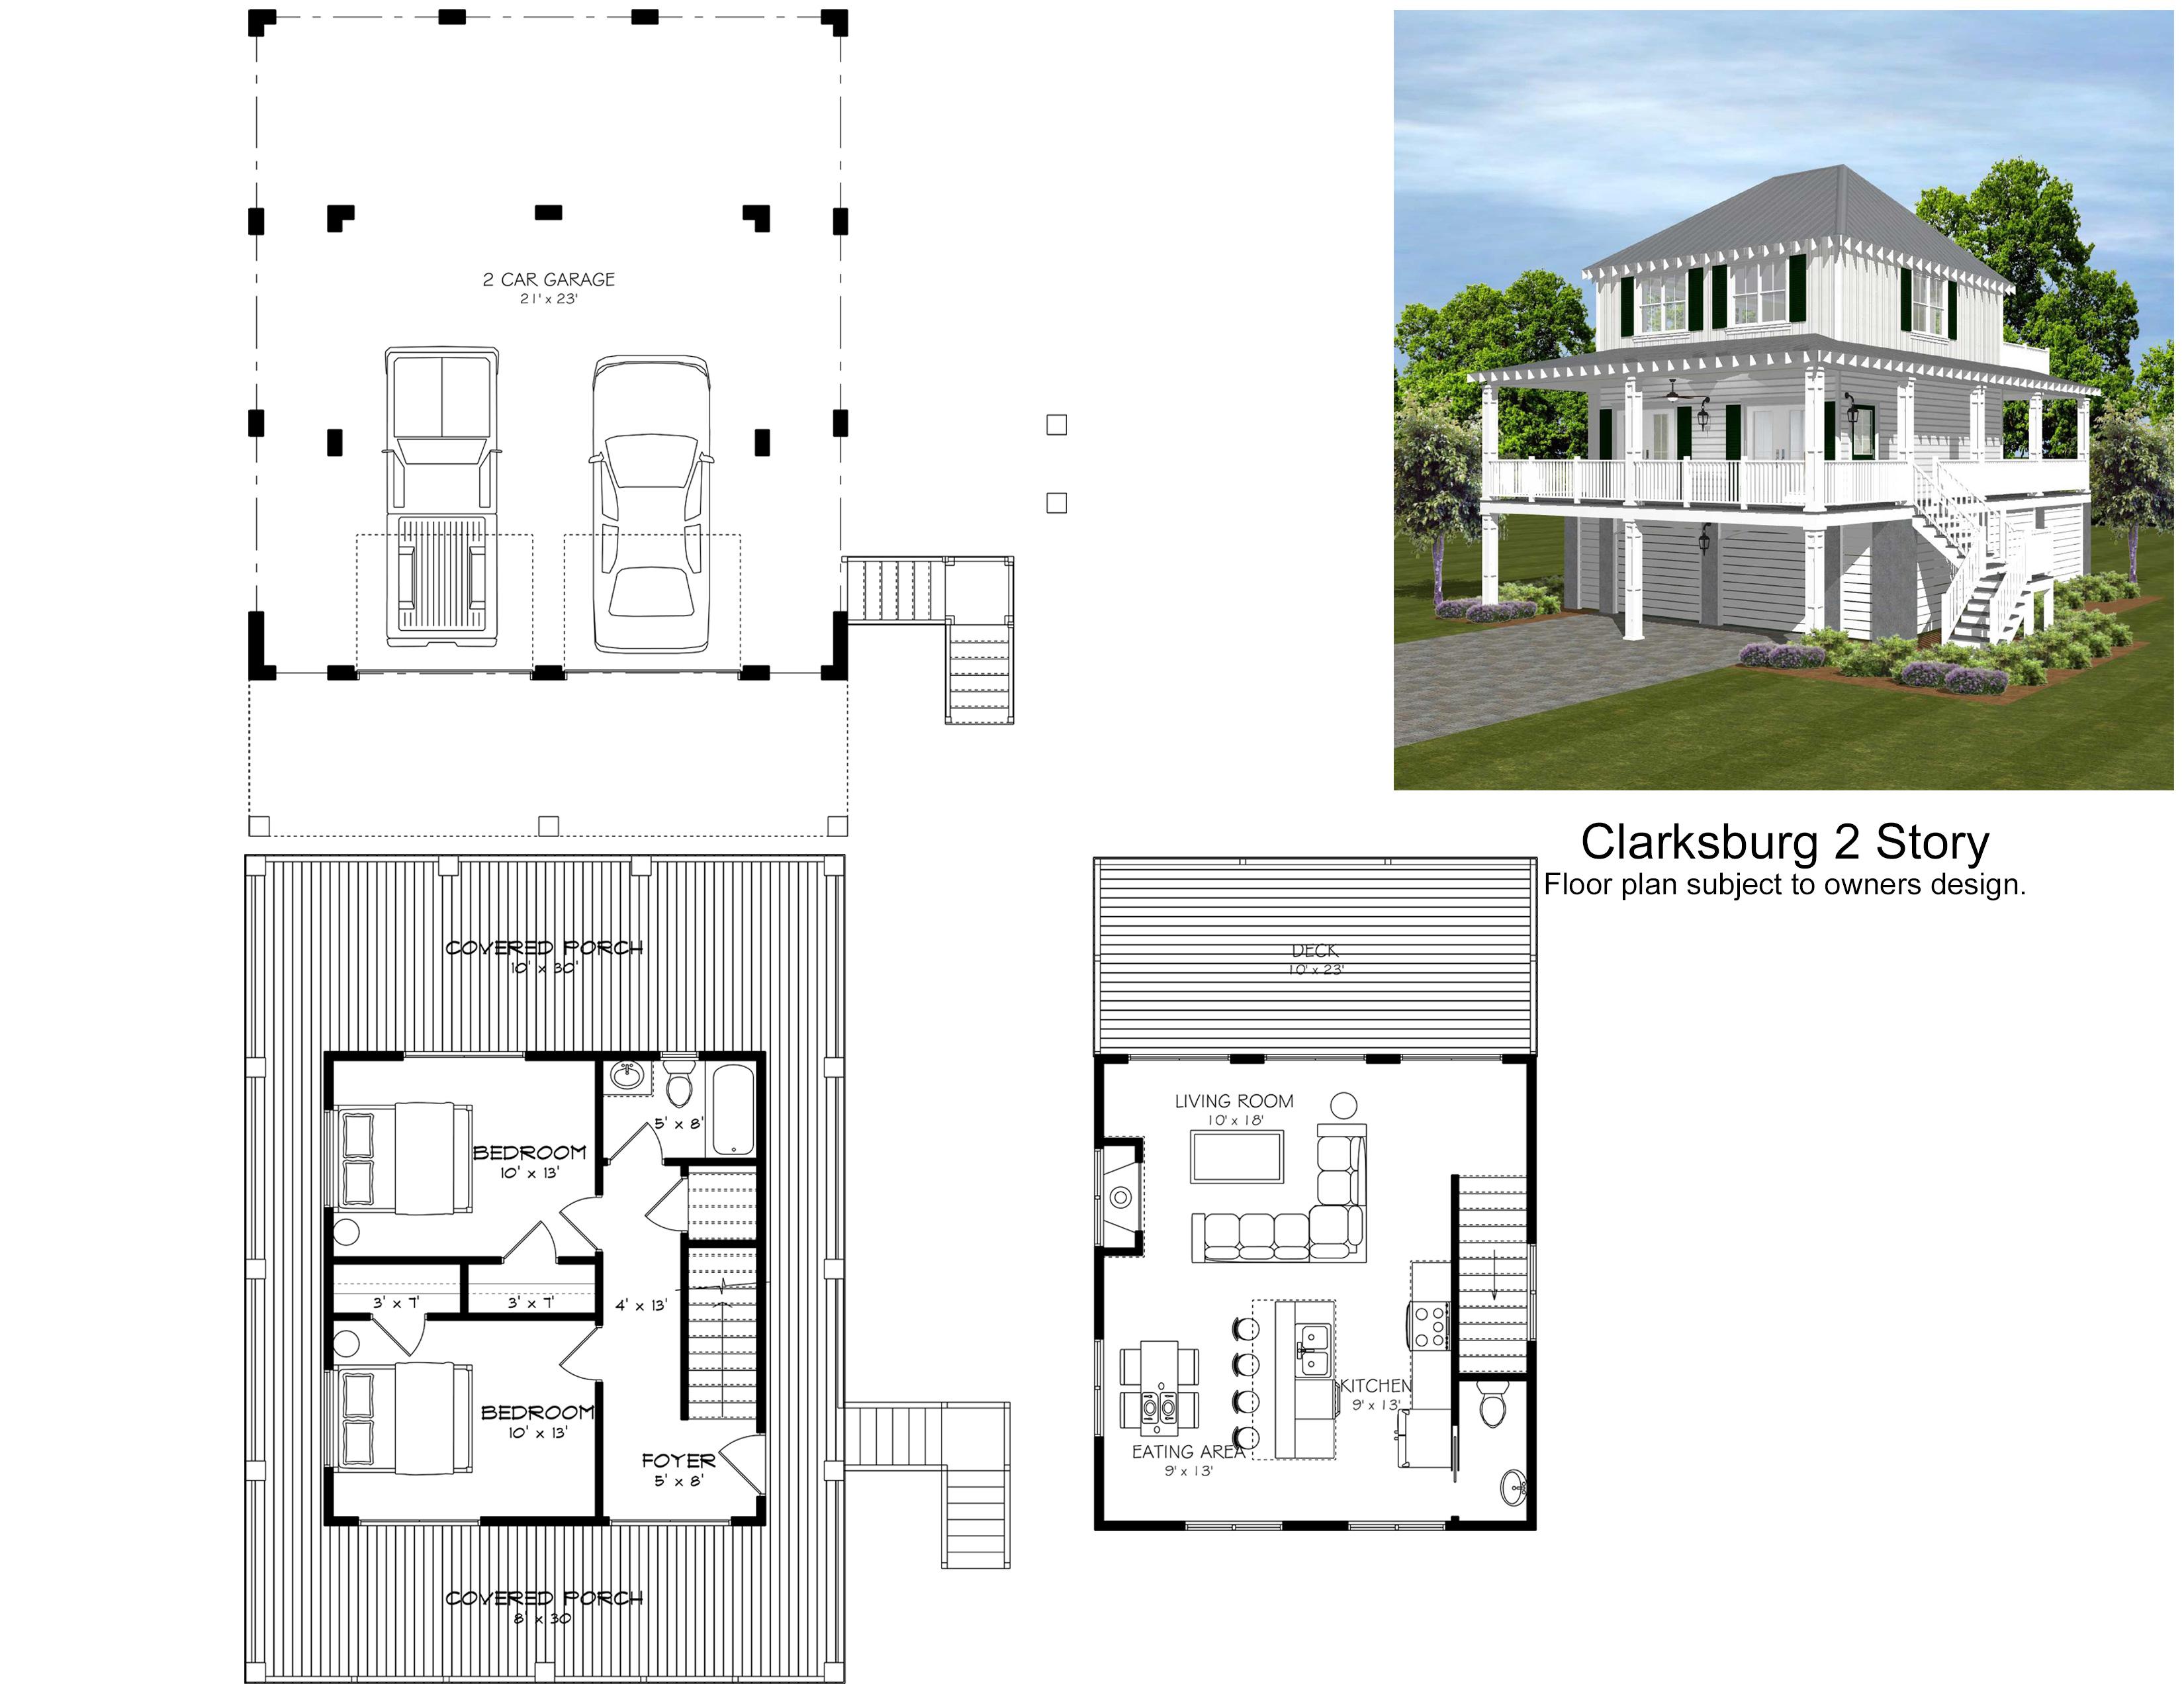 Clarksburg 2 Story